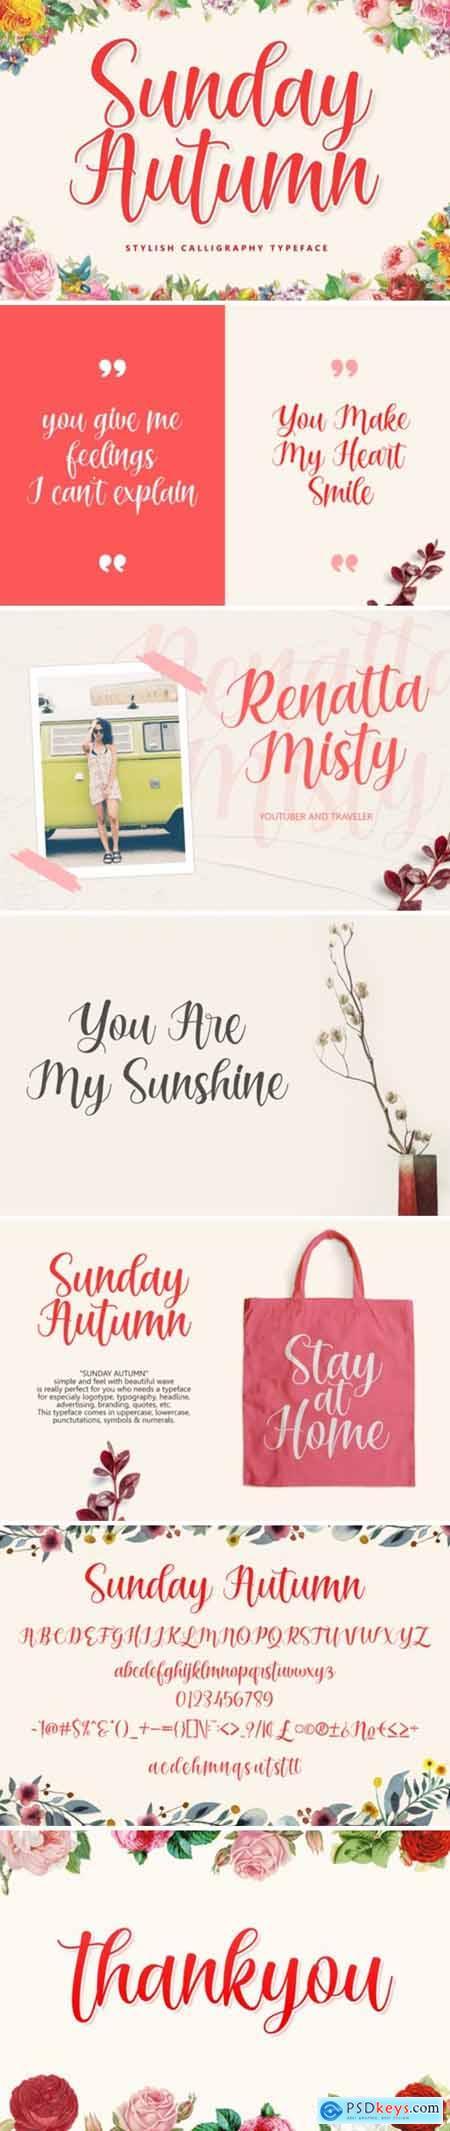 Sunday Autumn Font